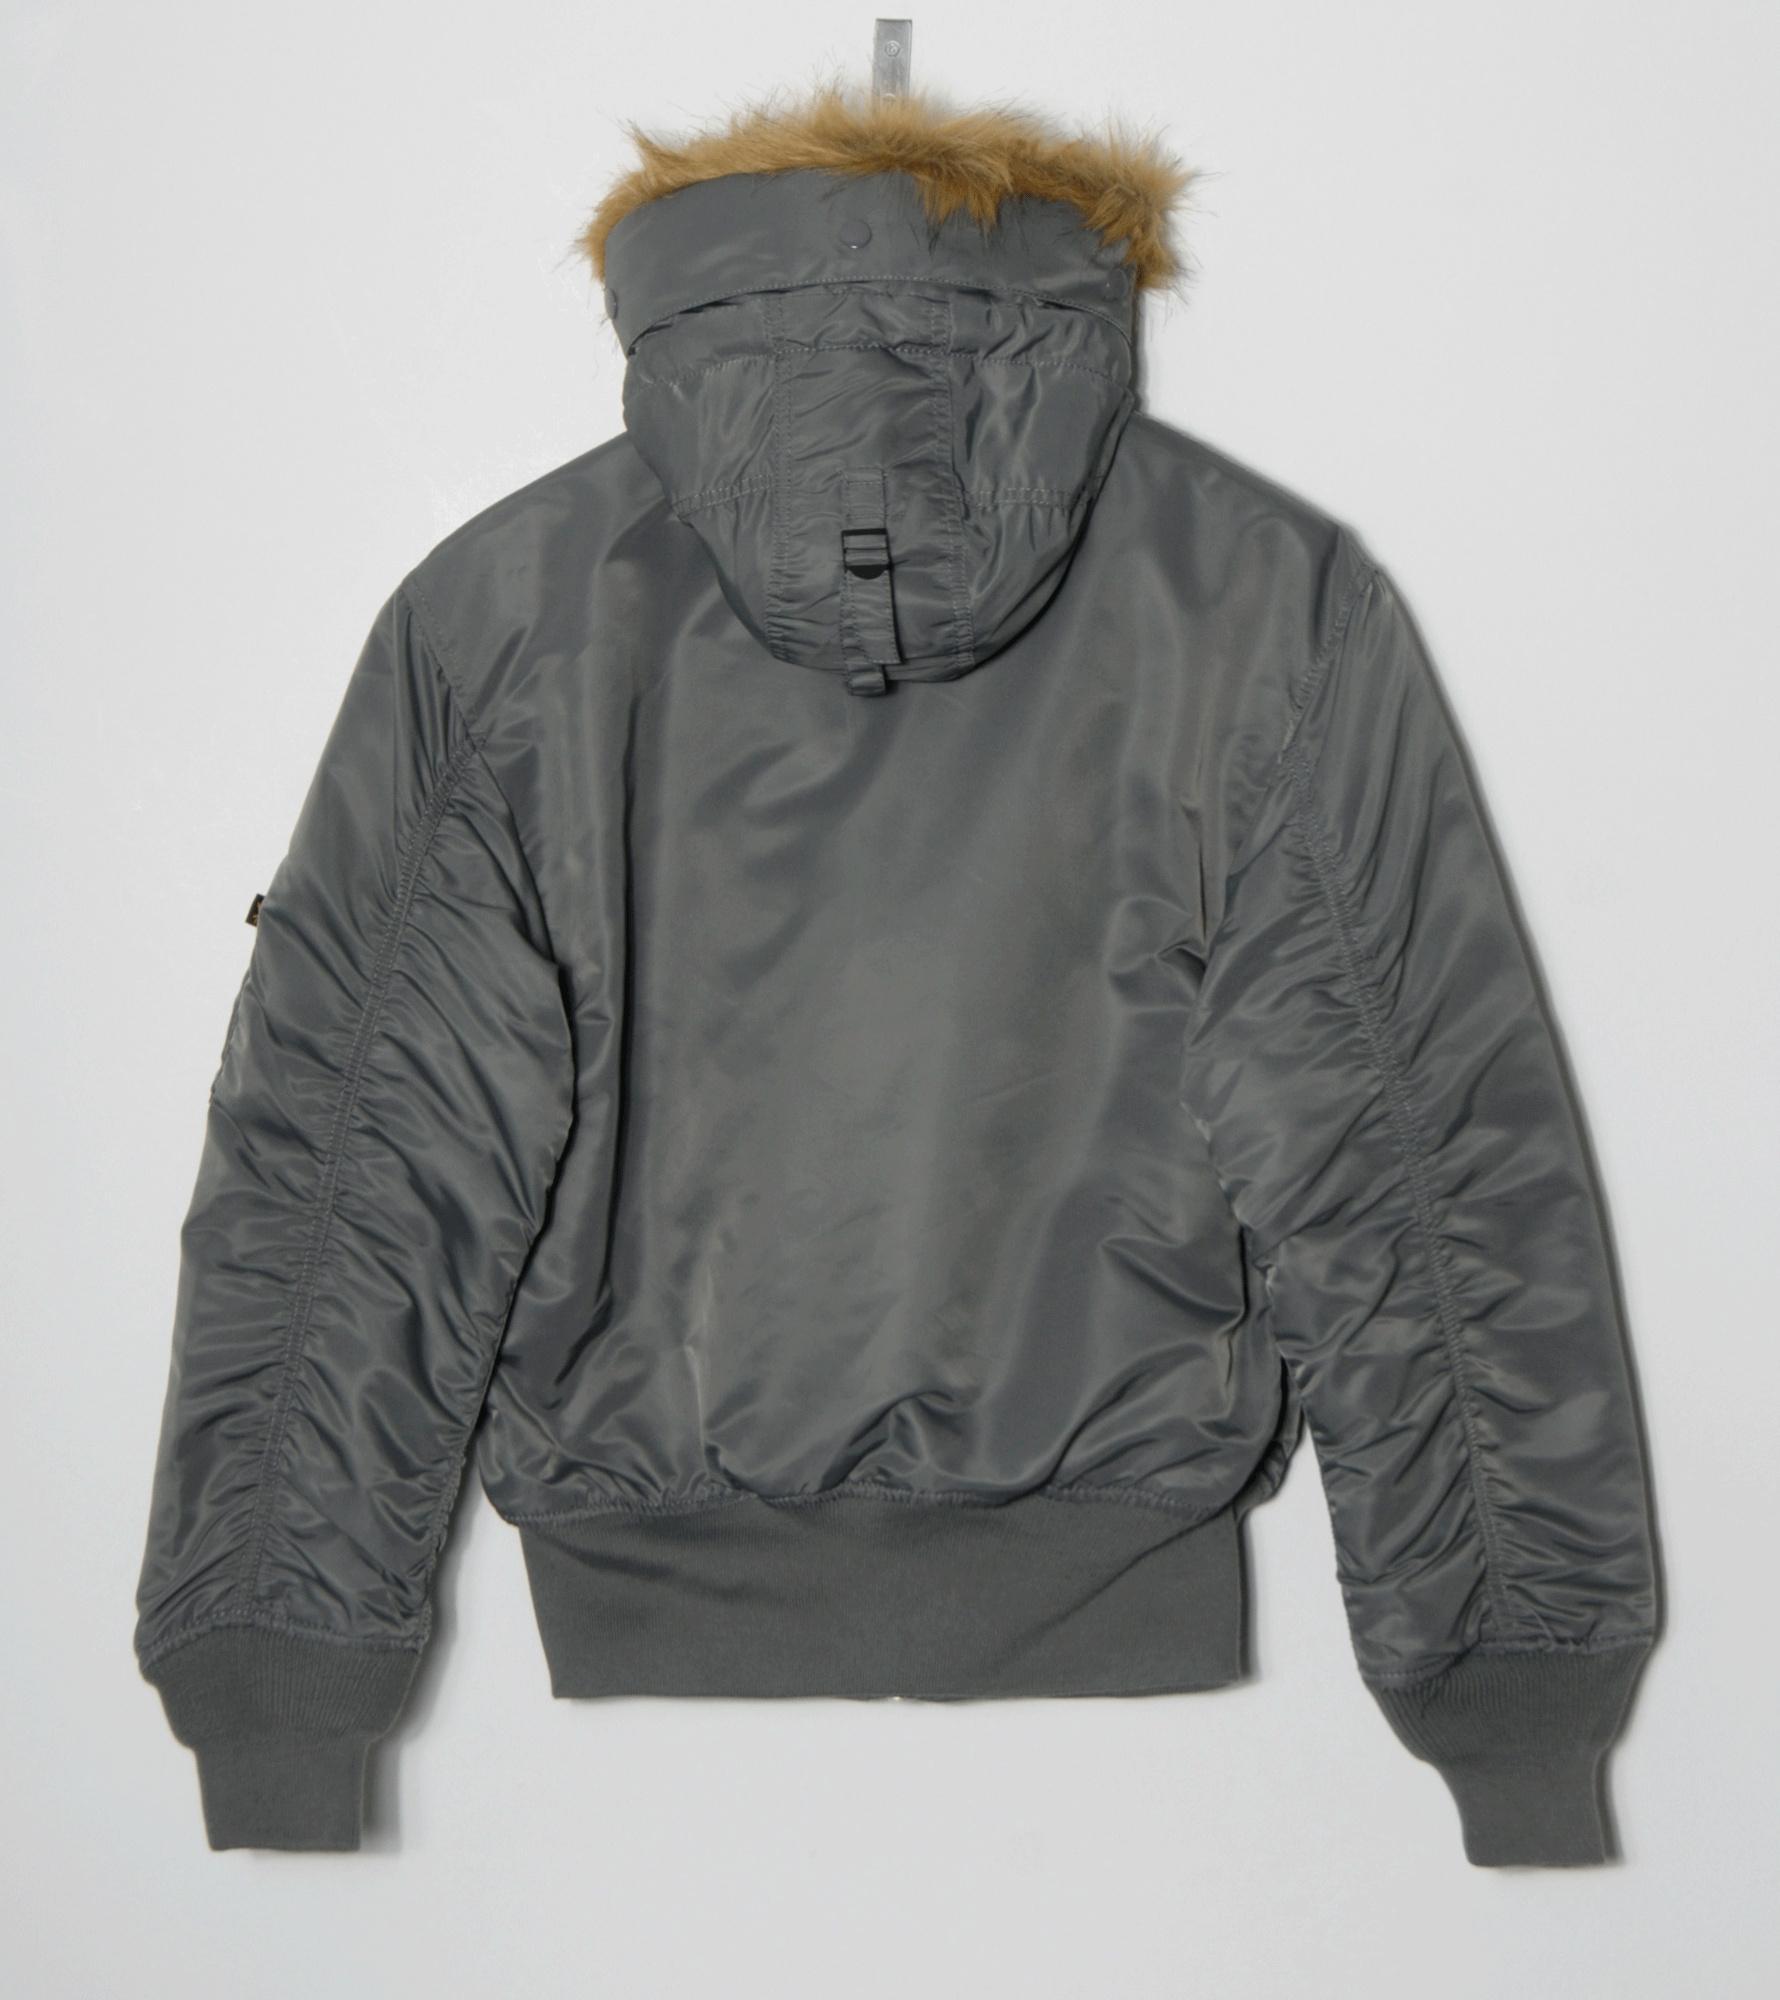 Alpha jacke 45p hooded